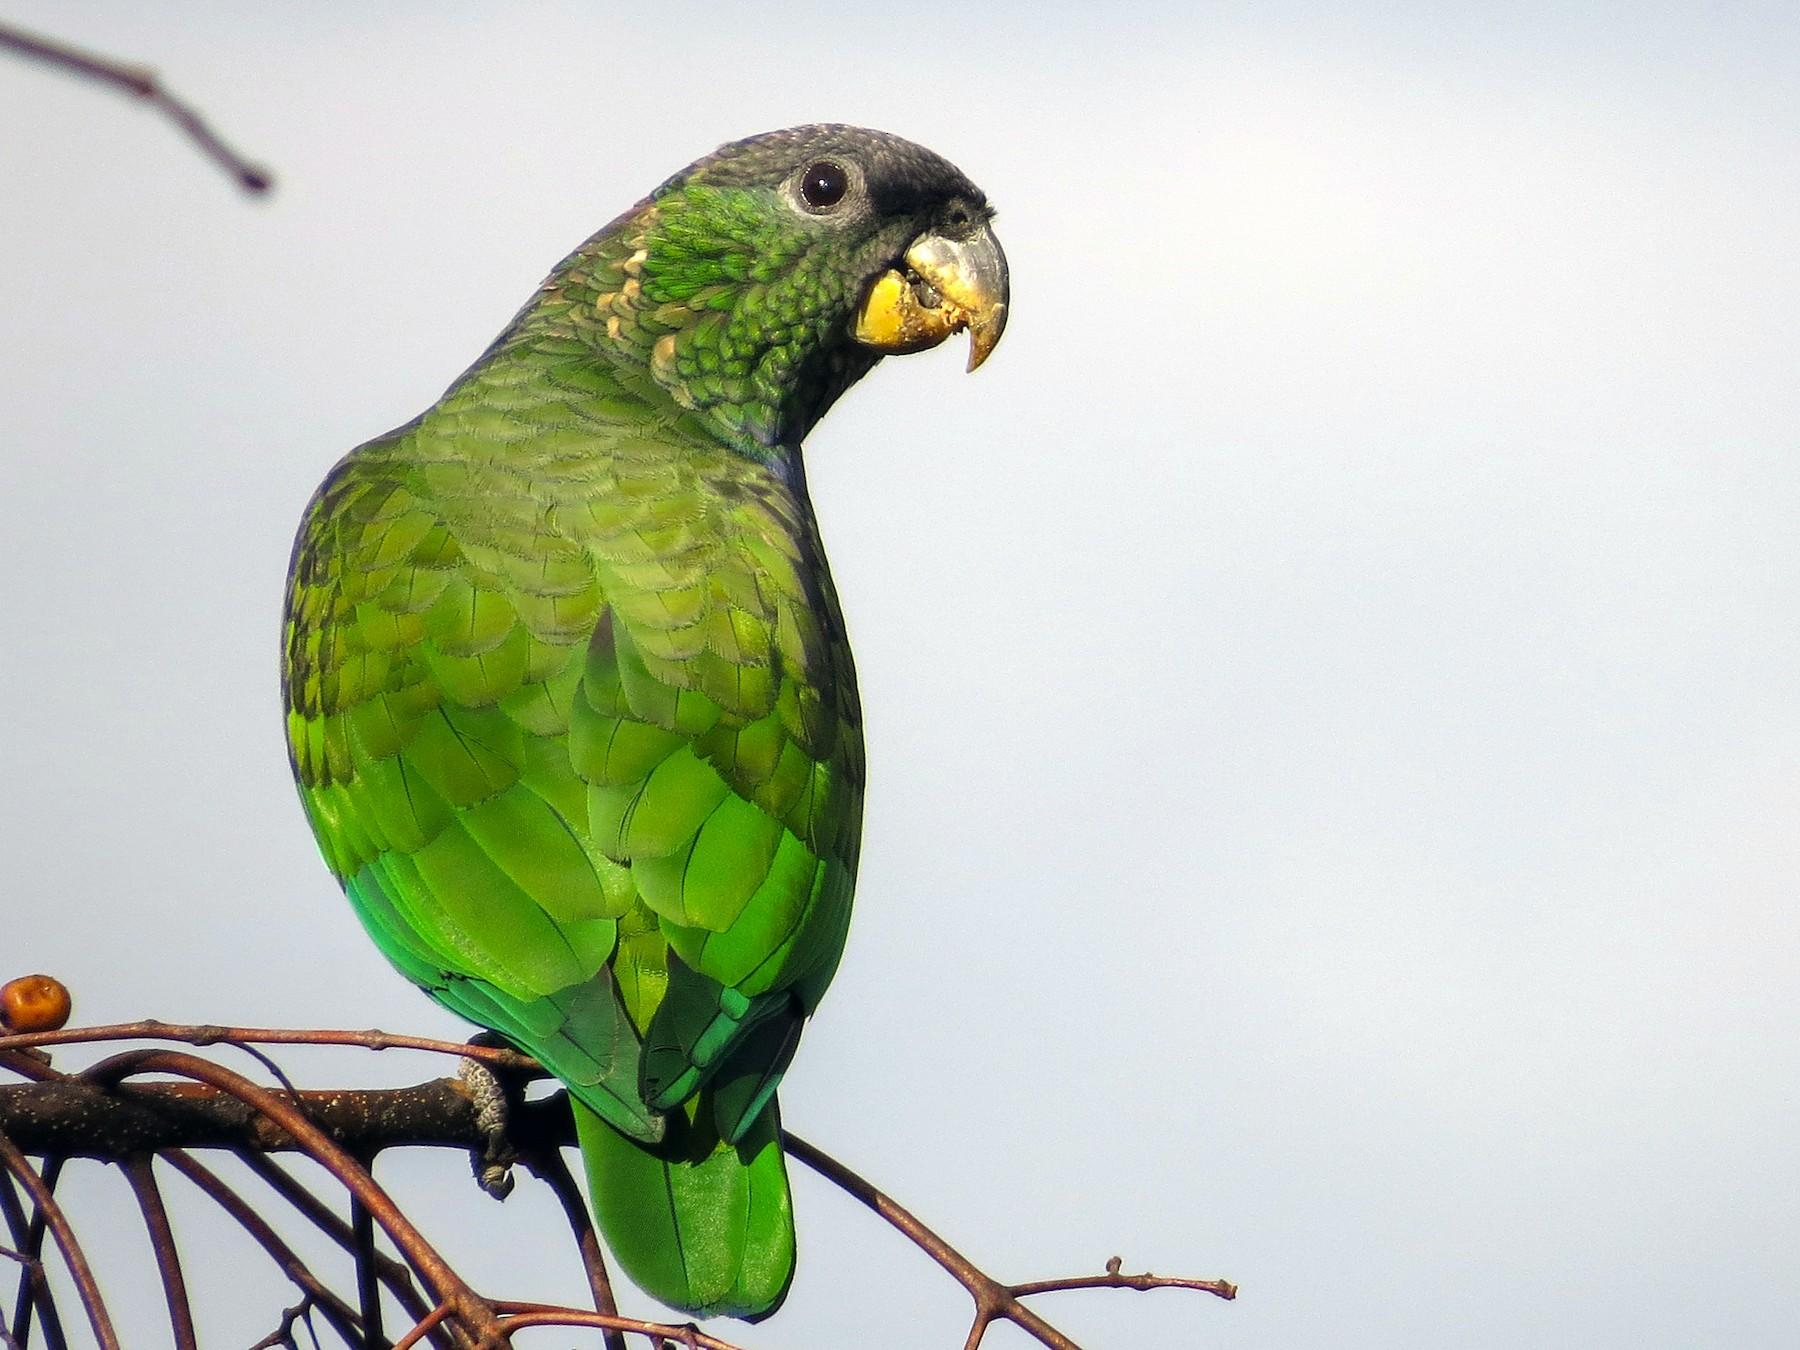 Scaly-headed Parrot - MARCELO JARDIM